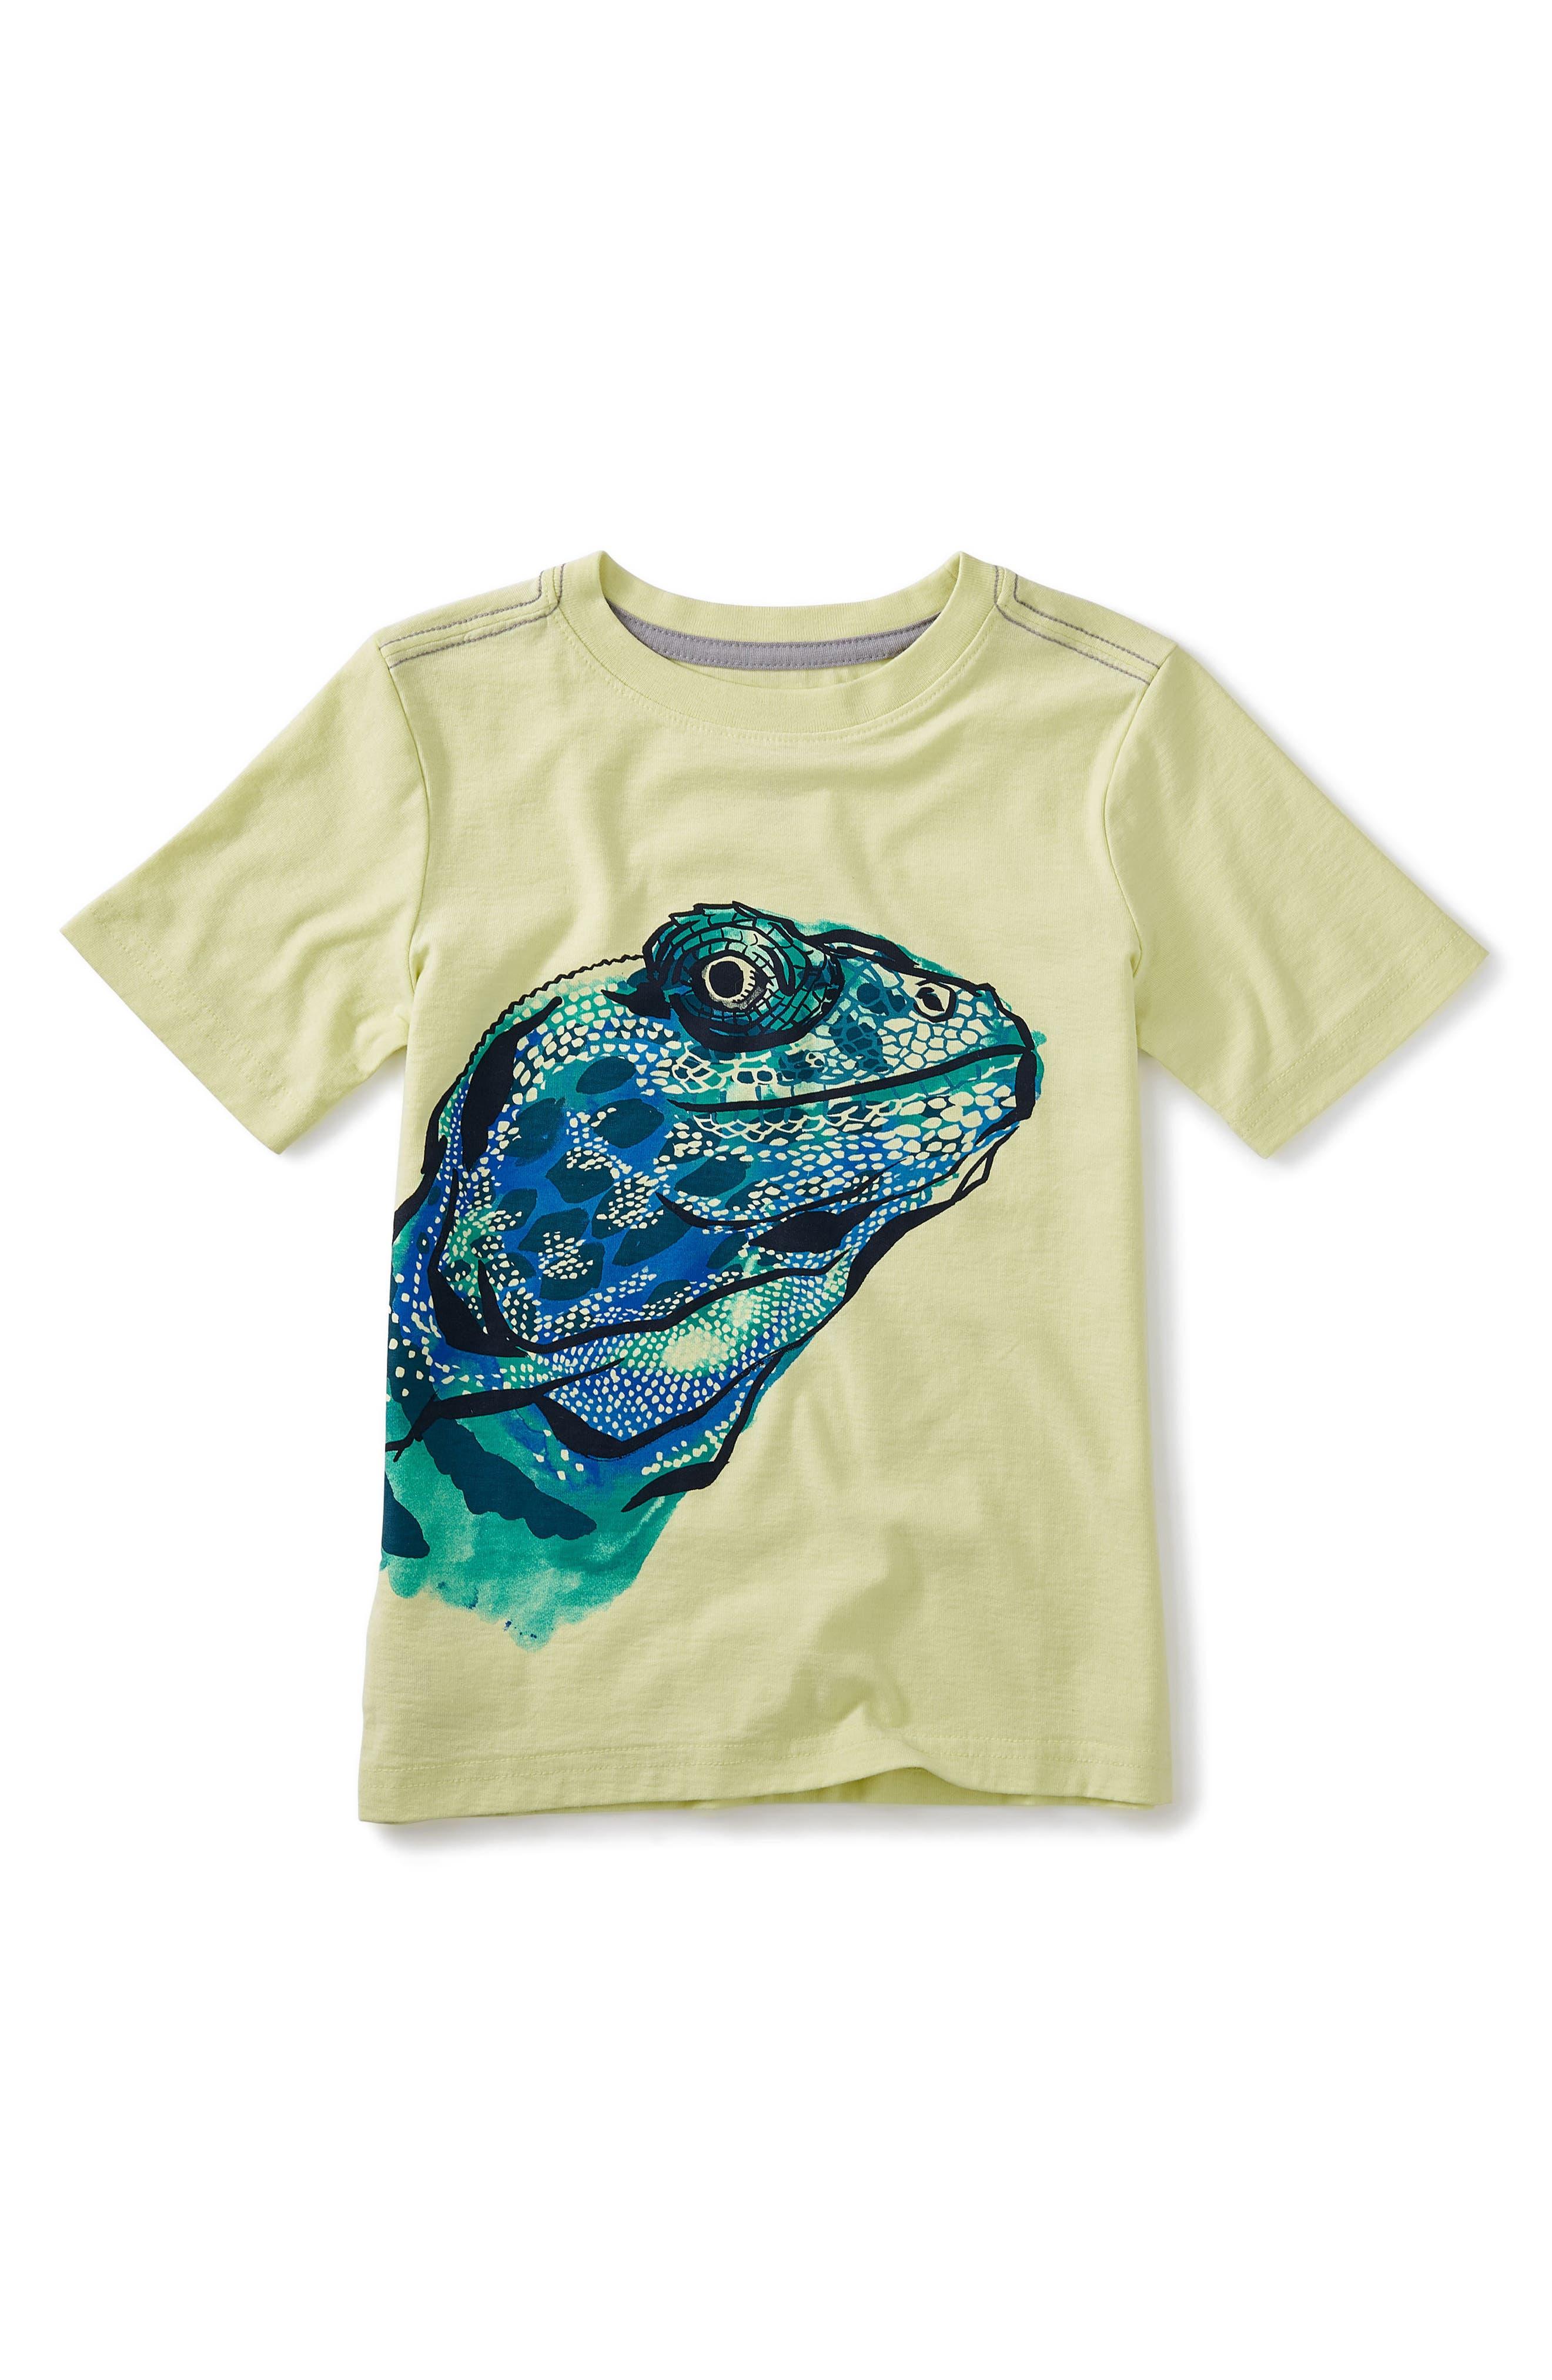 Tea Collection Lizard Graphic T-Shirt (Toddler Boys, Little Boys & Big Boys)